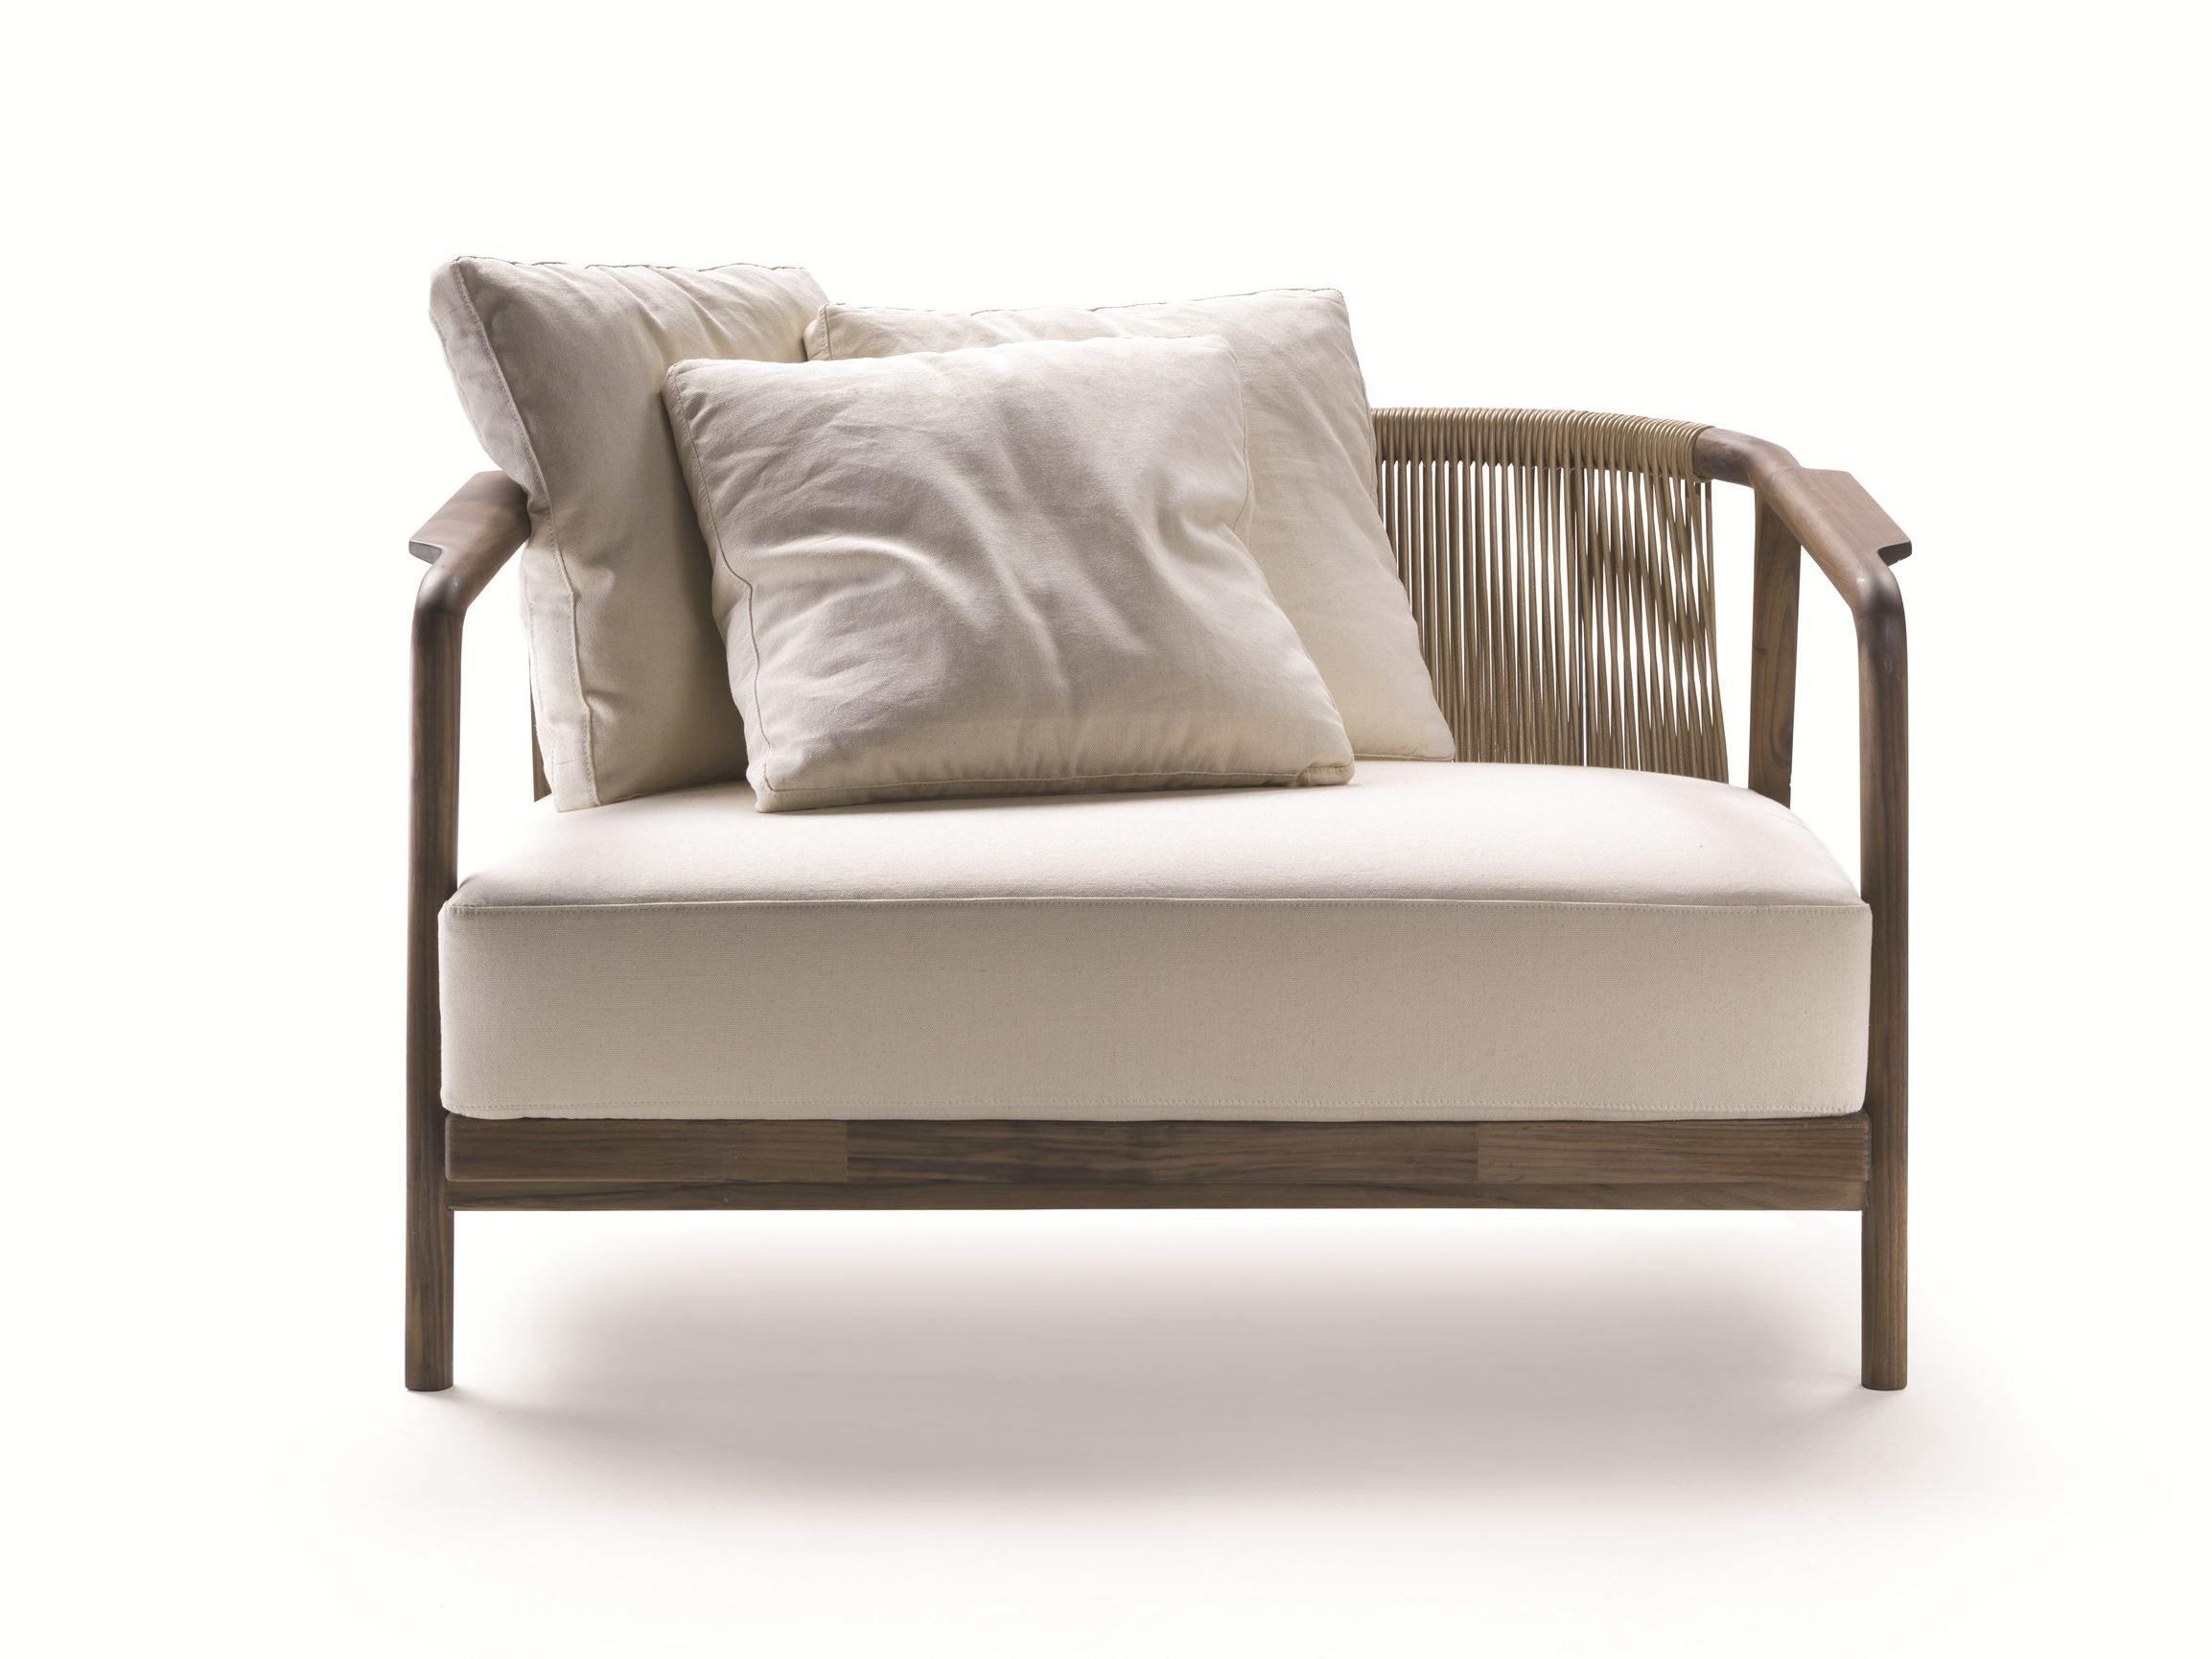 Small Sofas And Armchairs Chenille Fabric Sofa Cleaning Crono By Flexform Design Antonio Citterio